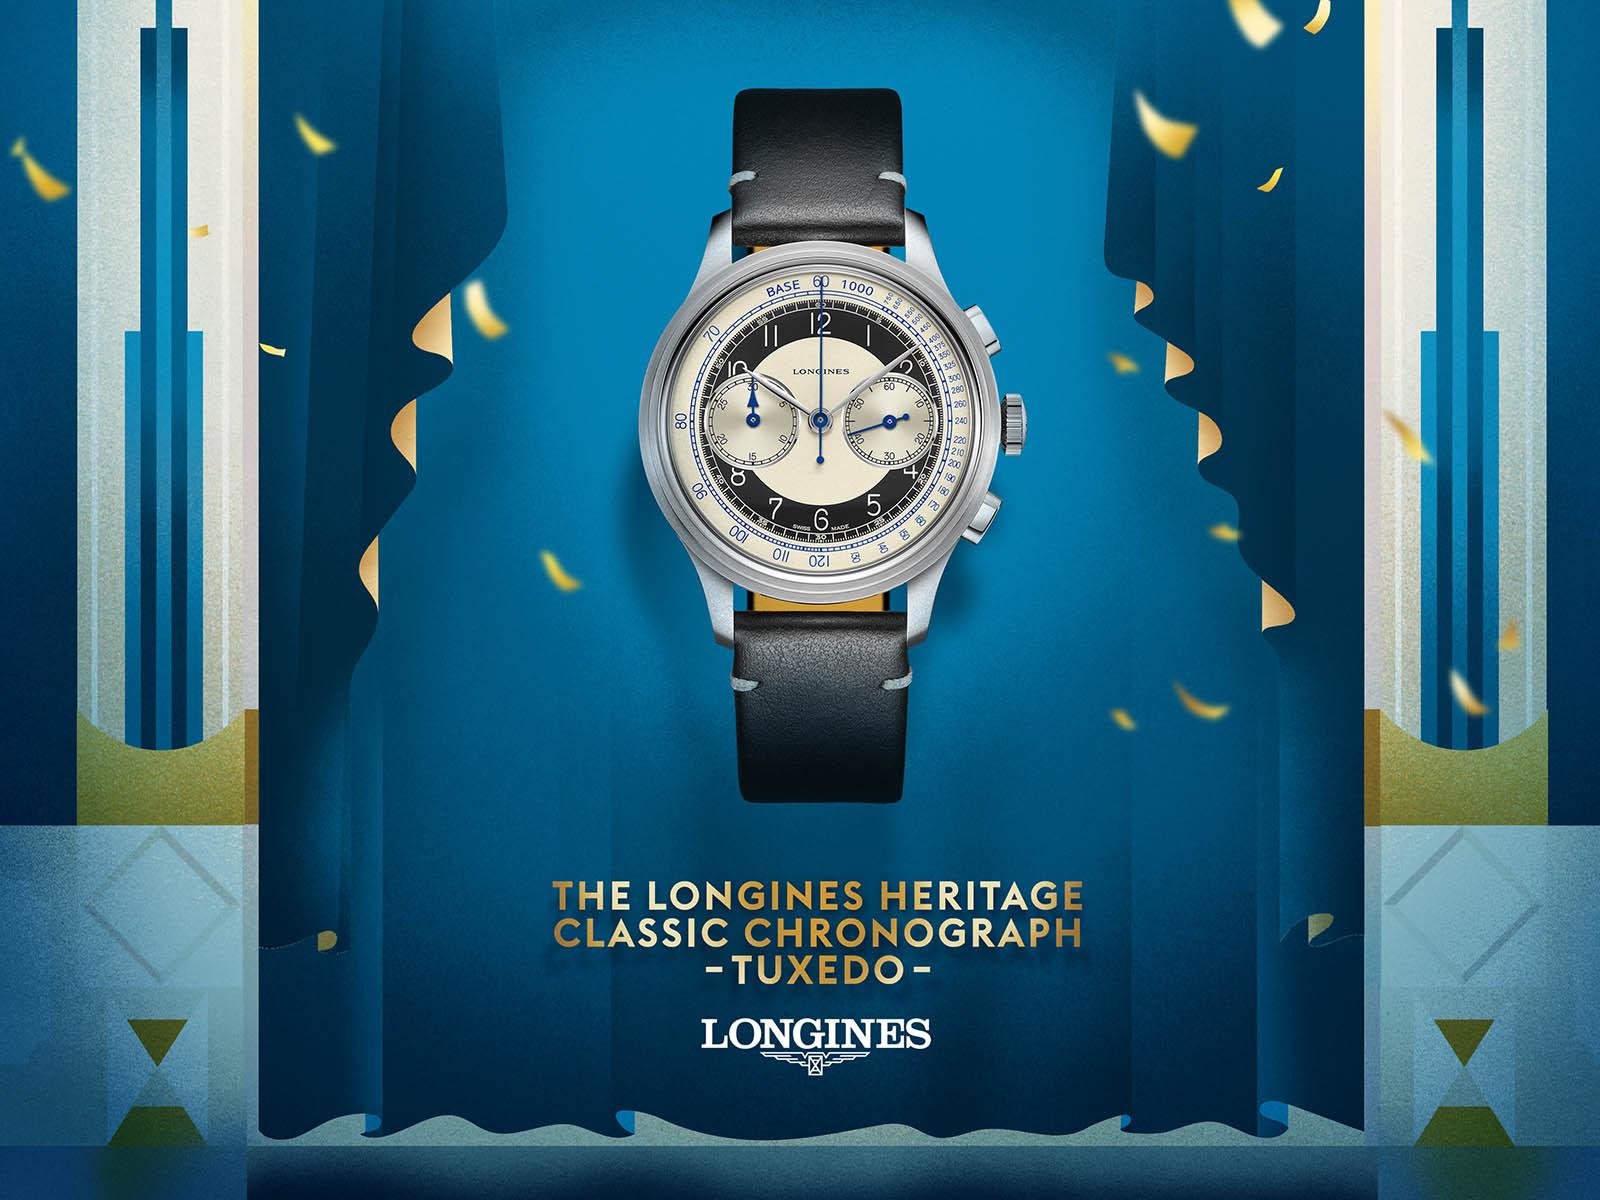 l2-830-4-93-0-longines-heritage-classic-chronograph-2.jpg